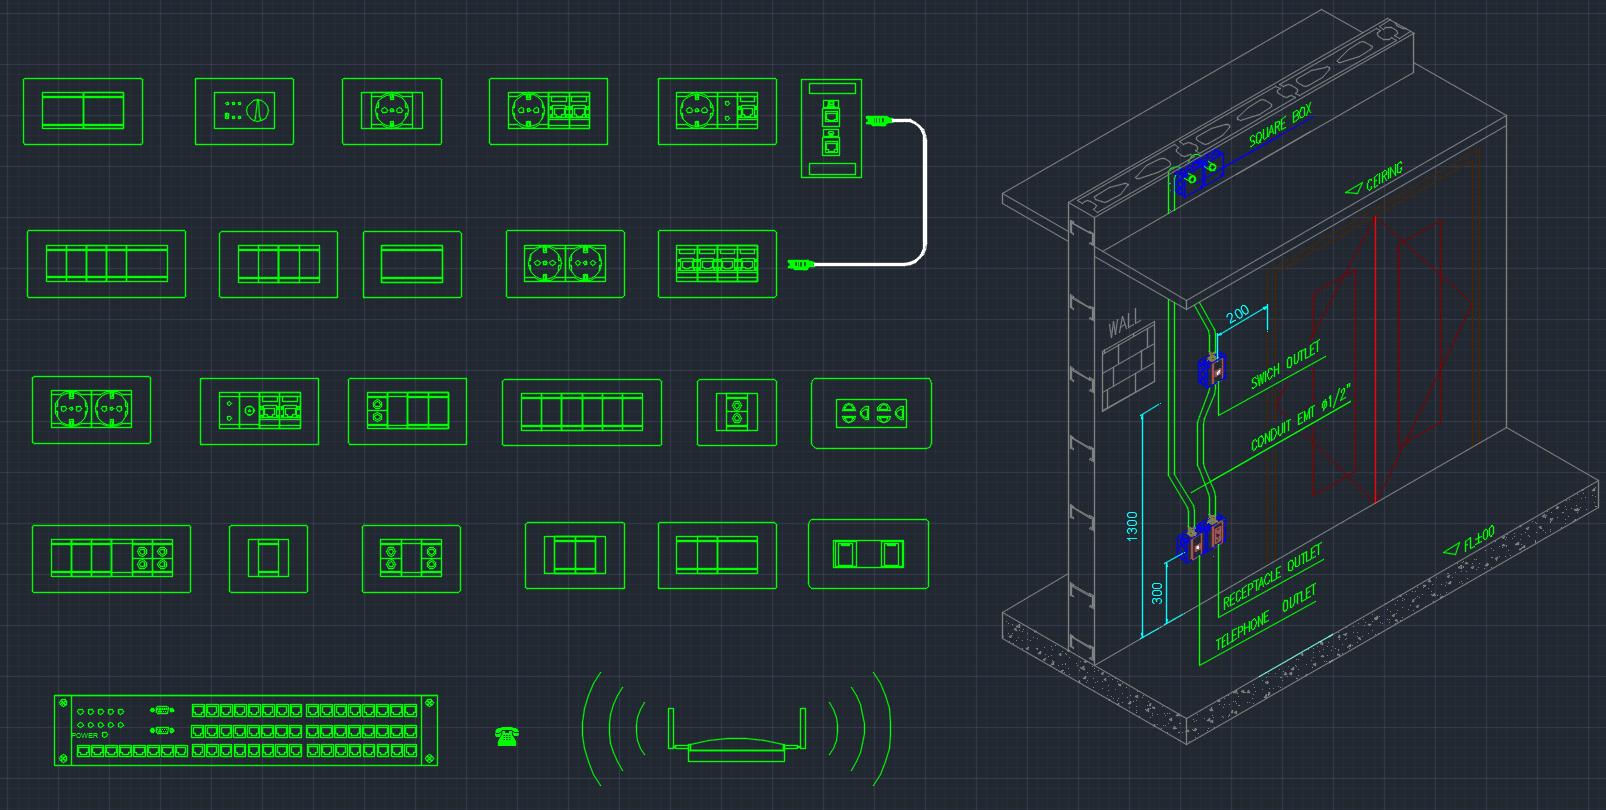 Sockets Switches CAD Blocks AutoCAD Free CAD Block Symbol And